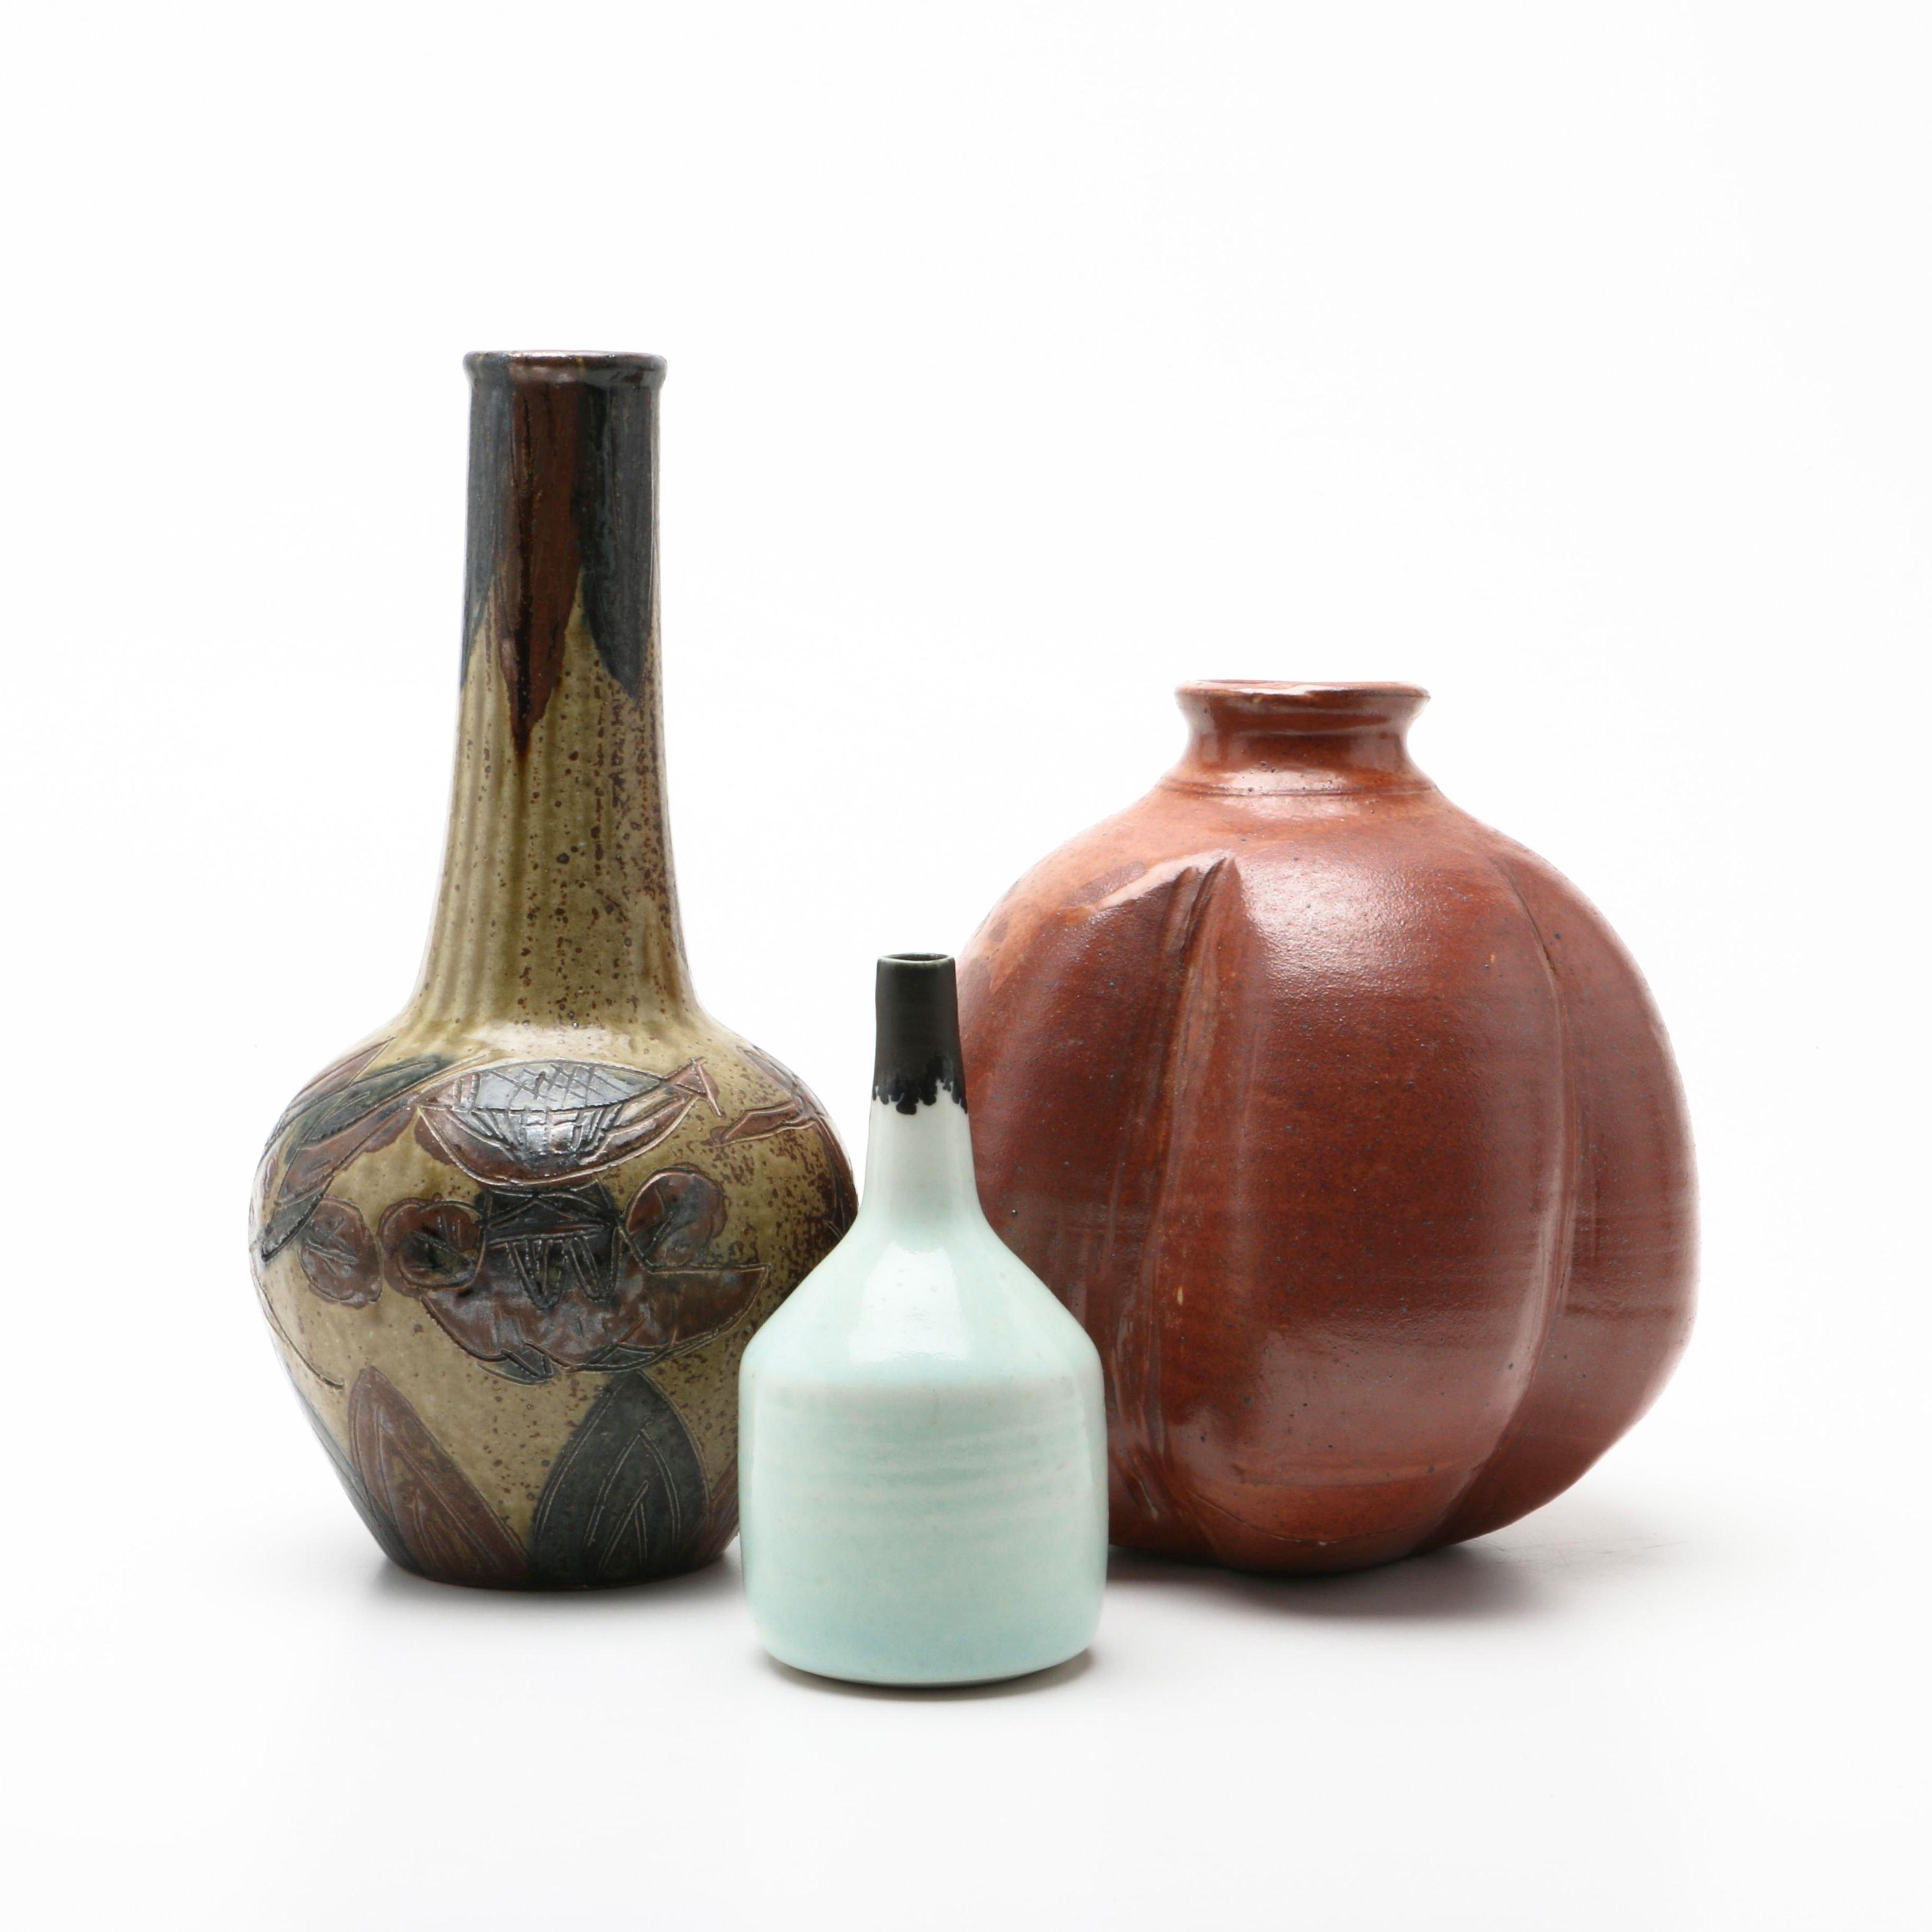 Wheel Thrown Stoneware and Porcelain Vases